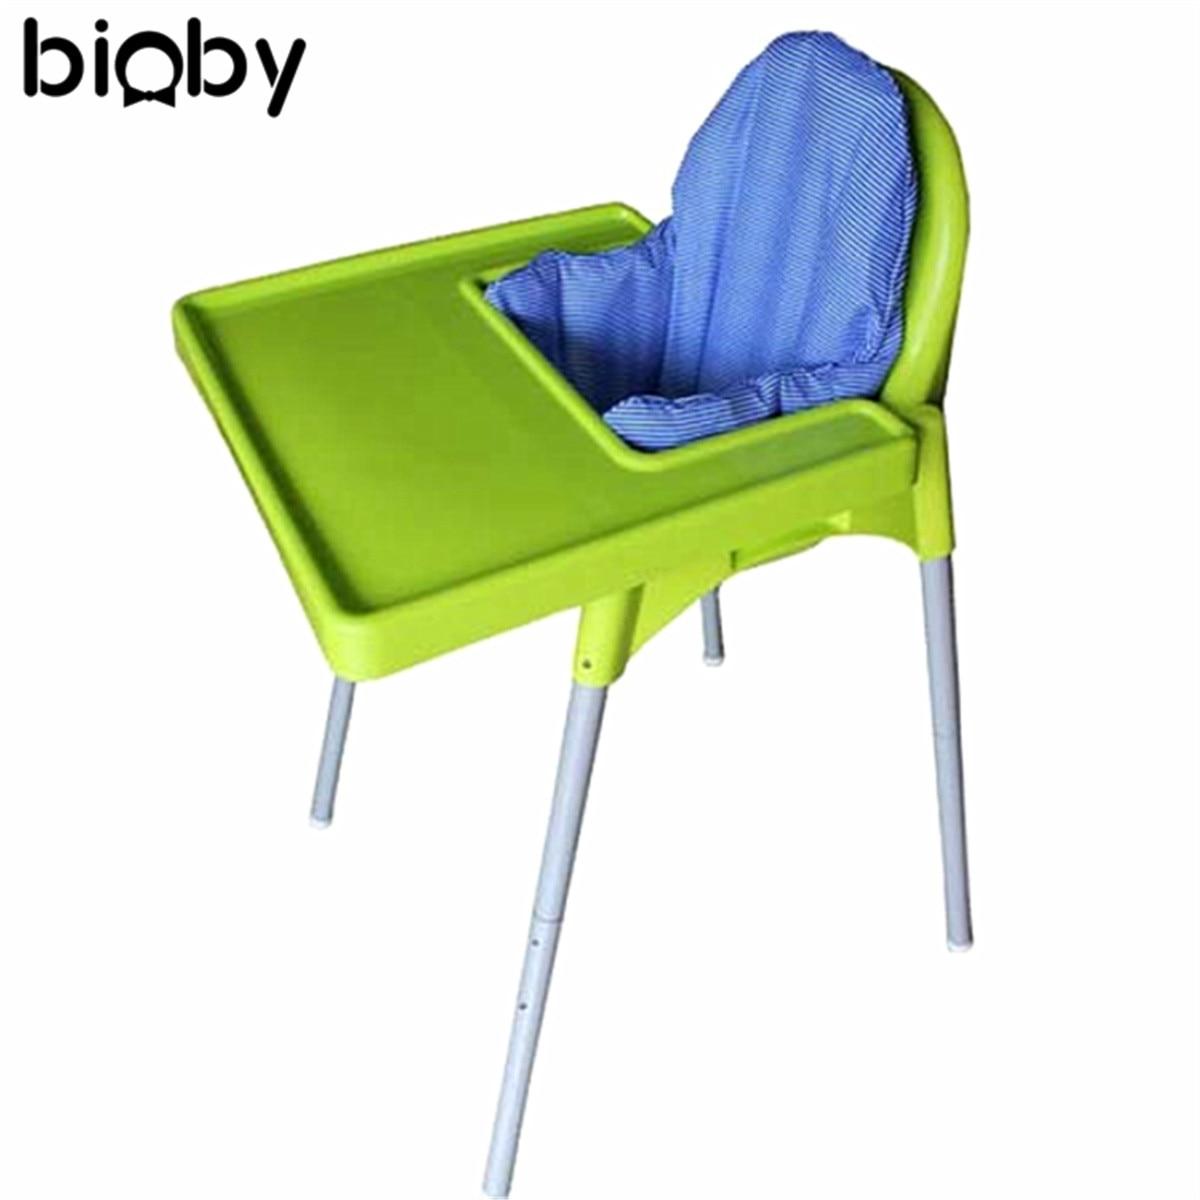 Attractive Inflatable Bath Chair Images - Bathtub Design Ideas ...